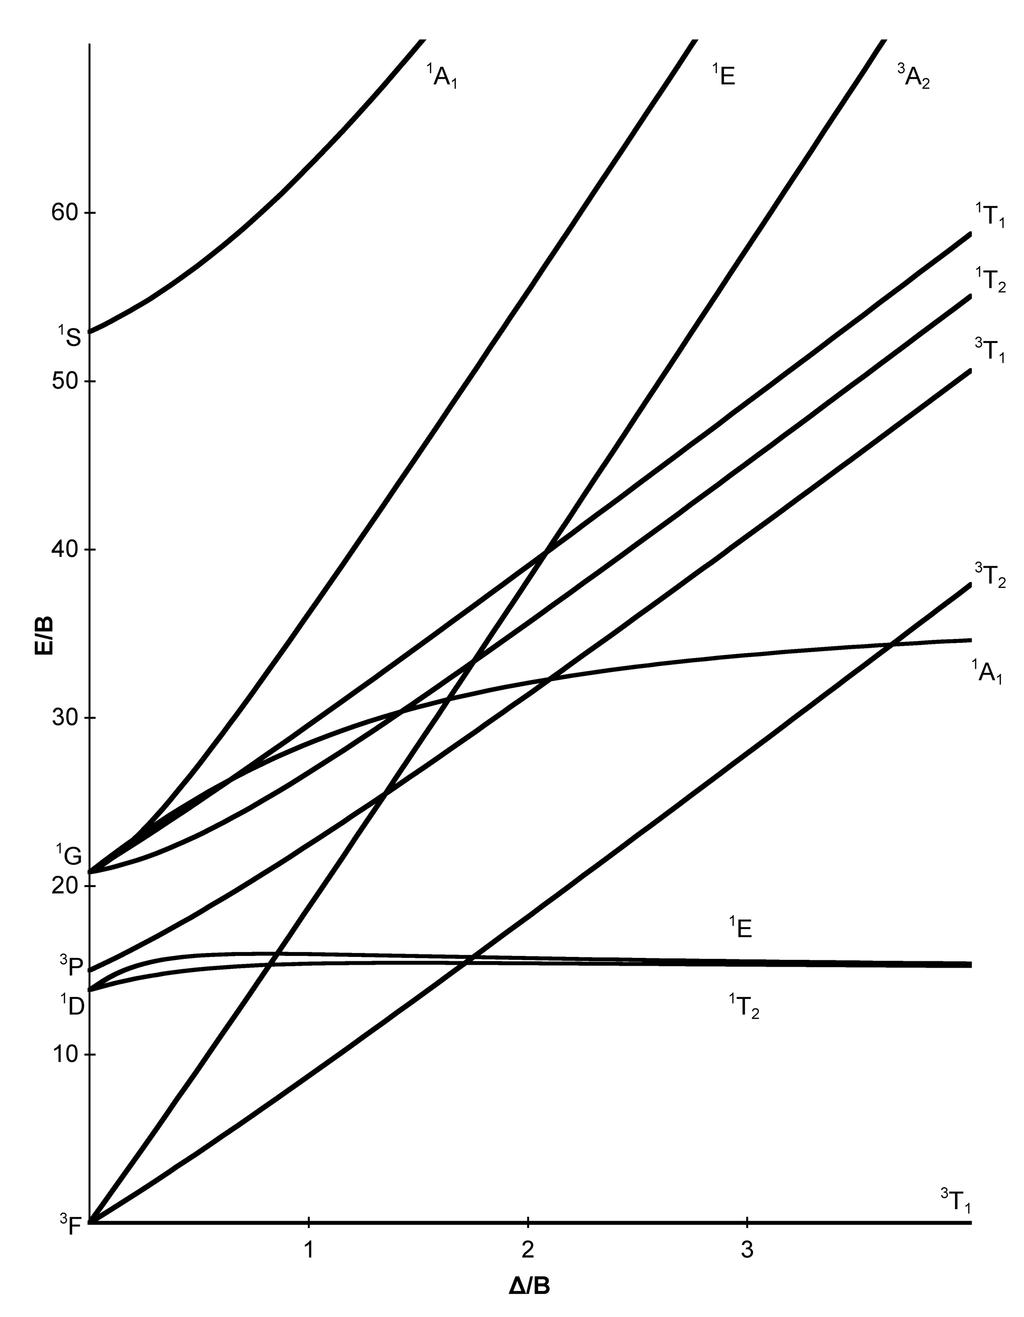 Tanabe-Sugano d2 diagram